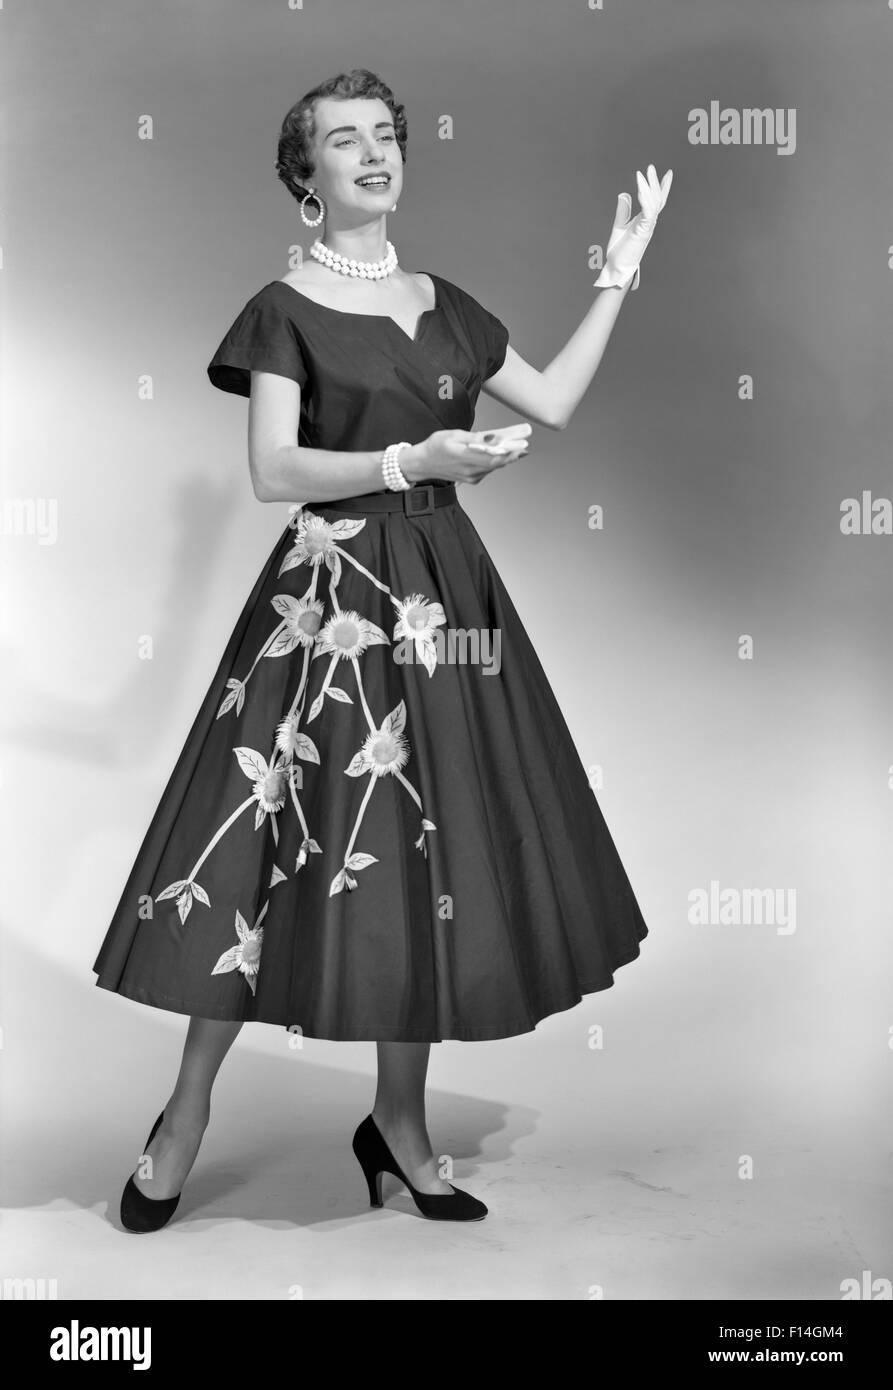 b6cbfe58933 1950s BRUNETTE WOMAN WEARING BLACK DRESS WITH FLOWERS GLOVES PEARL CHOKER